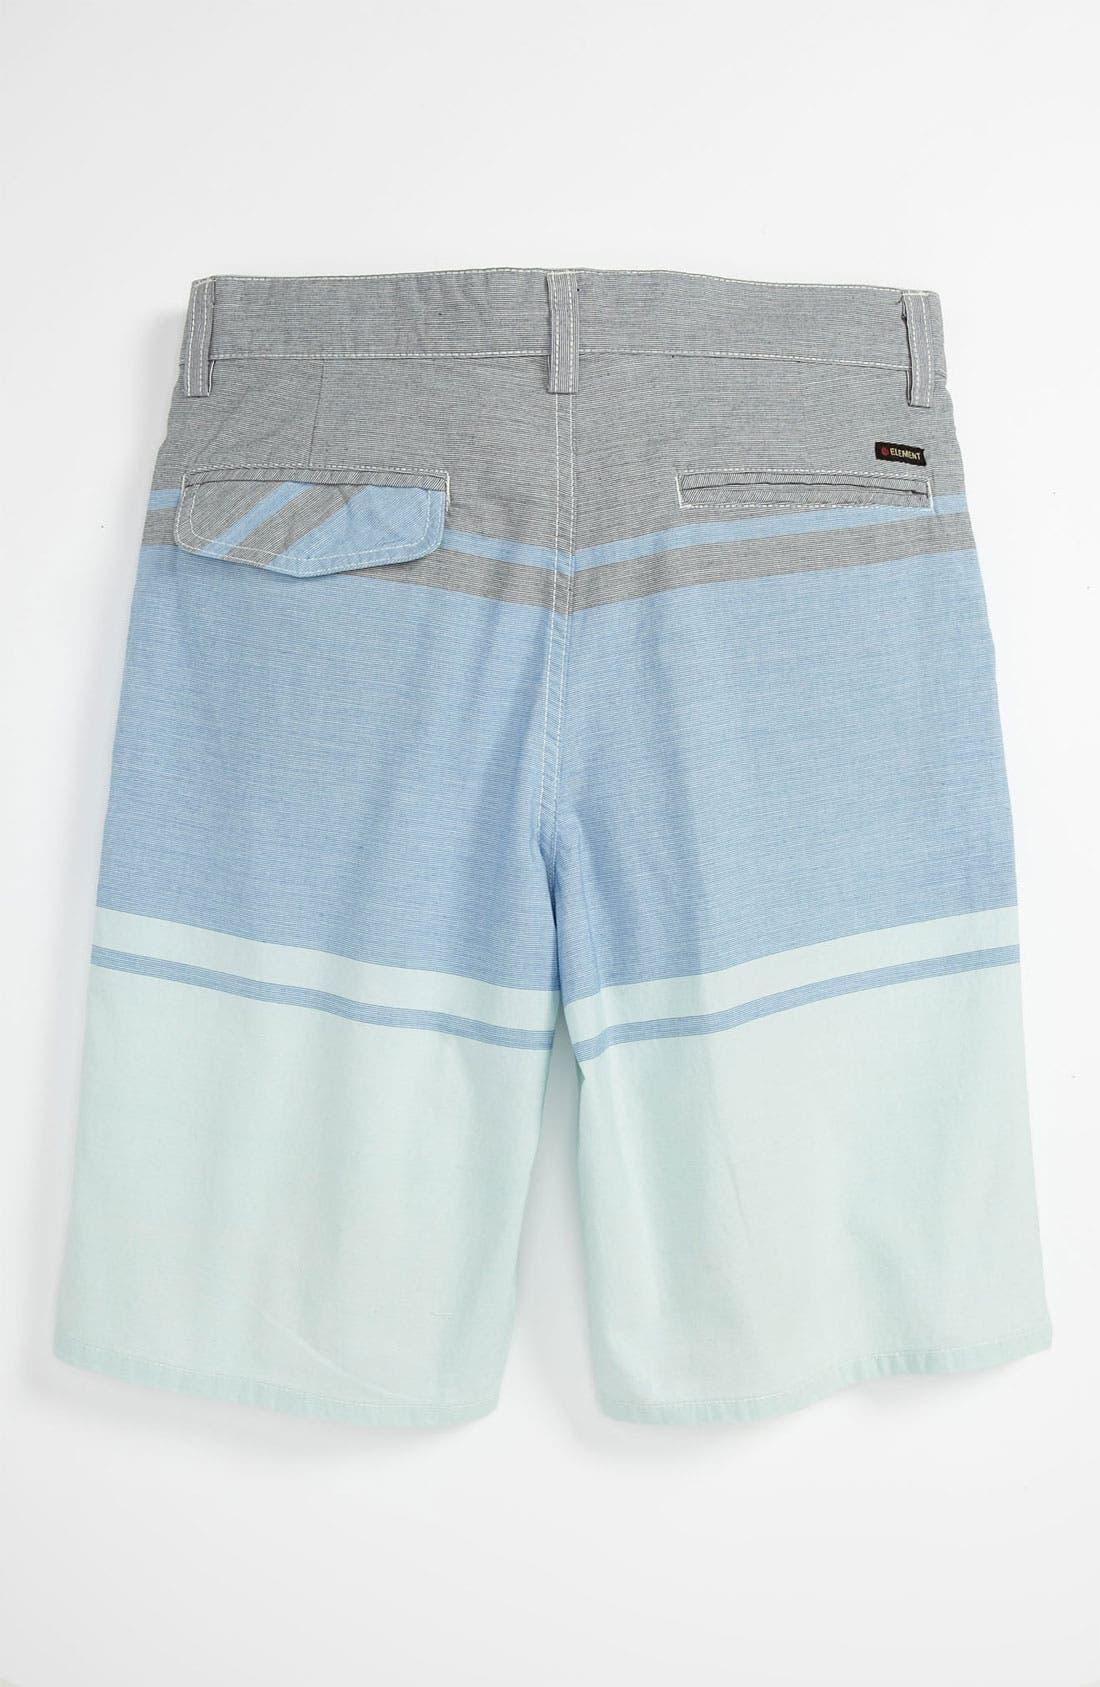 Alternate Image 2  - Element 'Alex' Yarn Dyed Shorts (Big Boys)